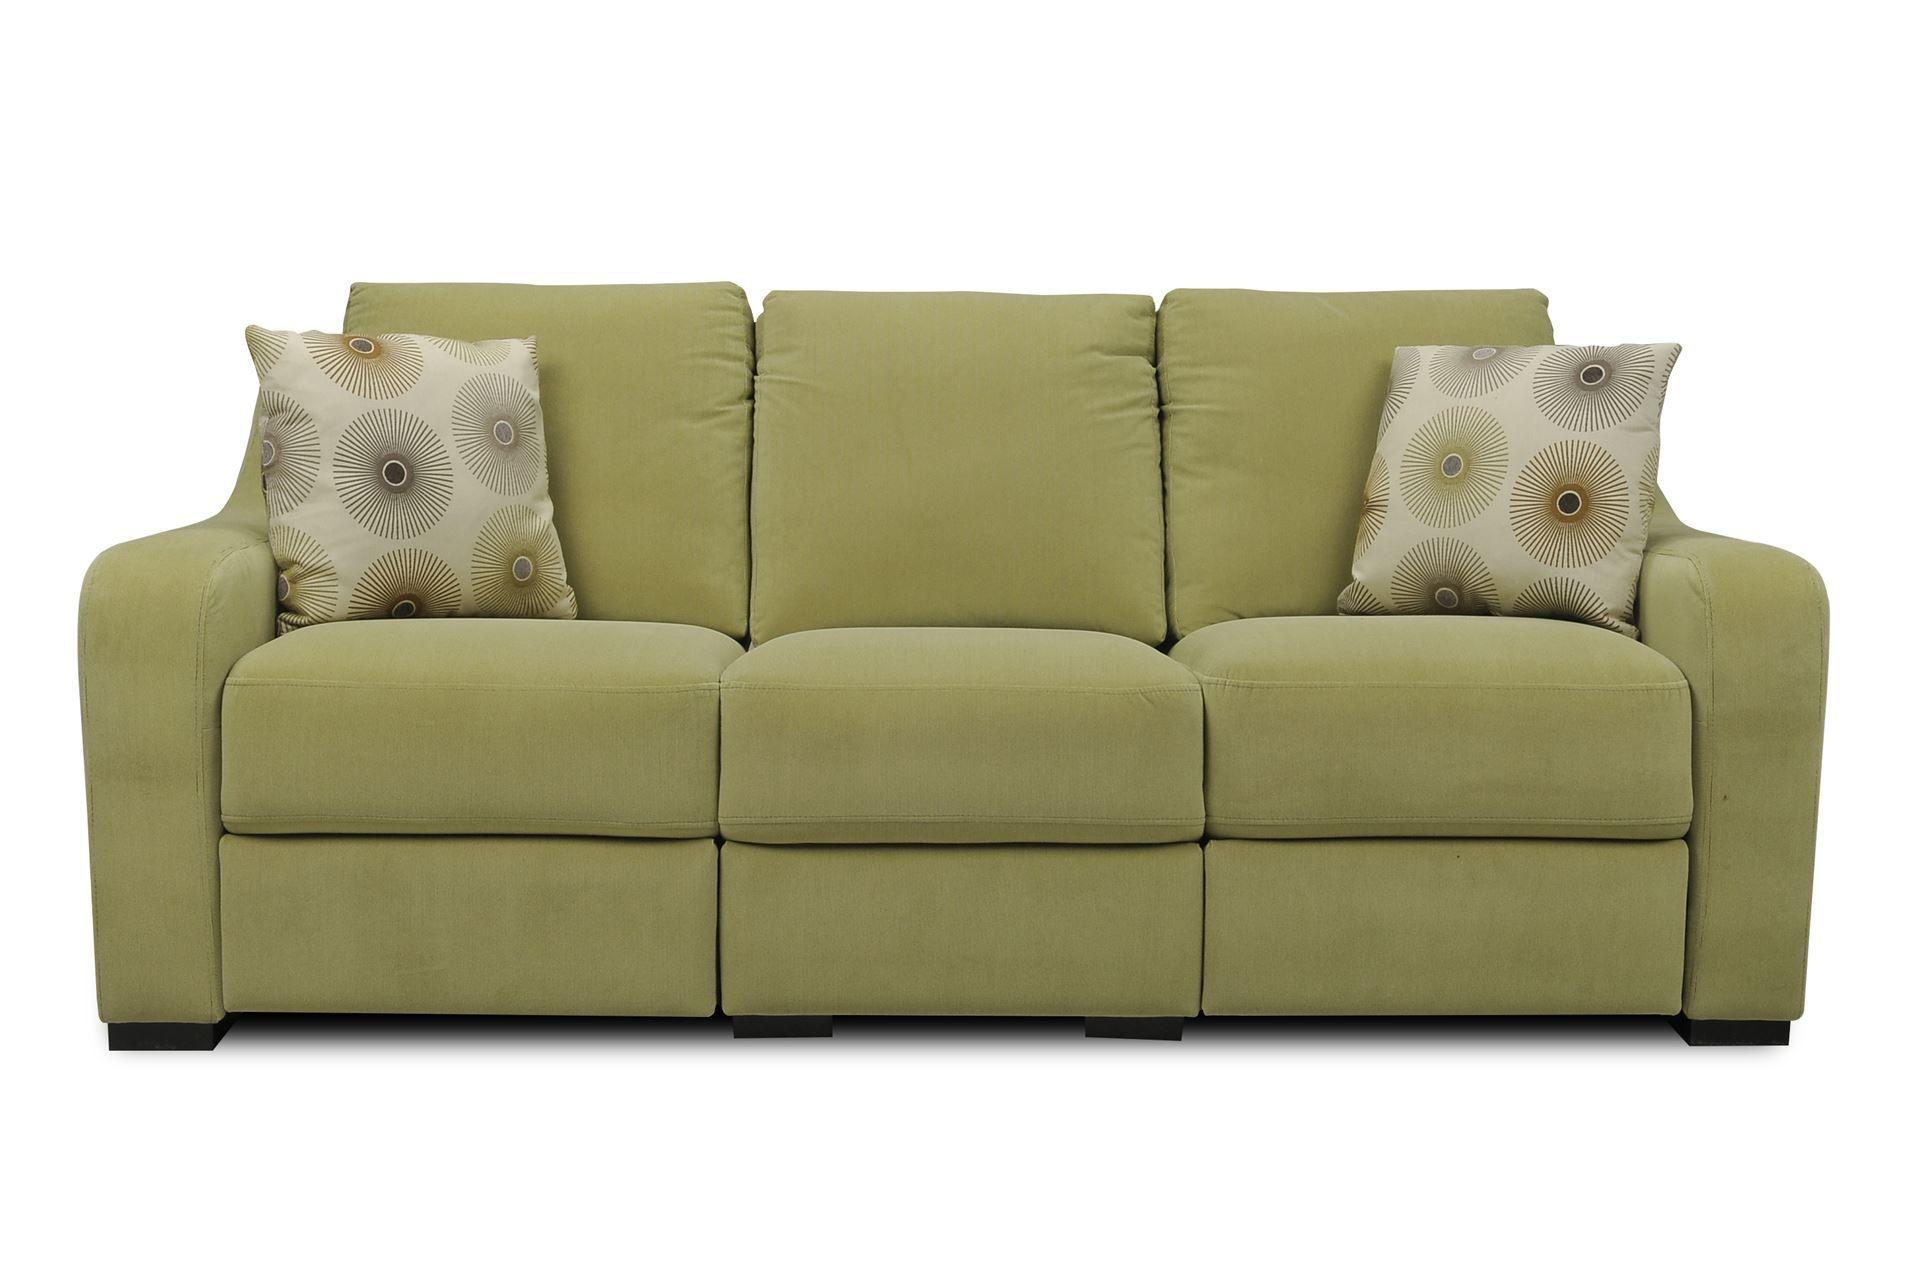 Astoria Fab Dual Reclining Sofa These Pillows Suck And I